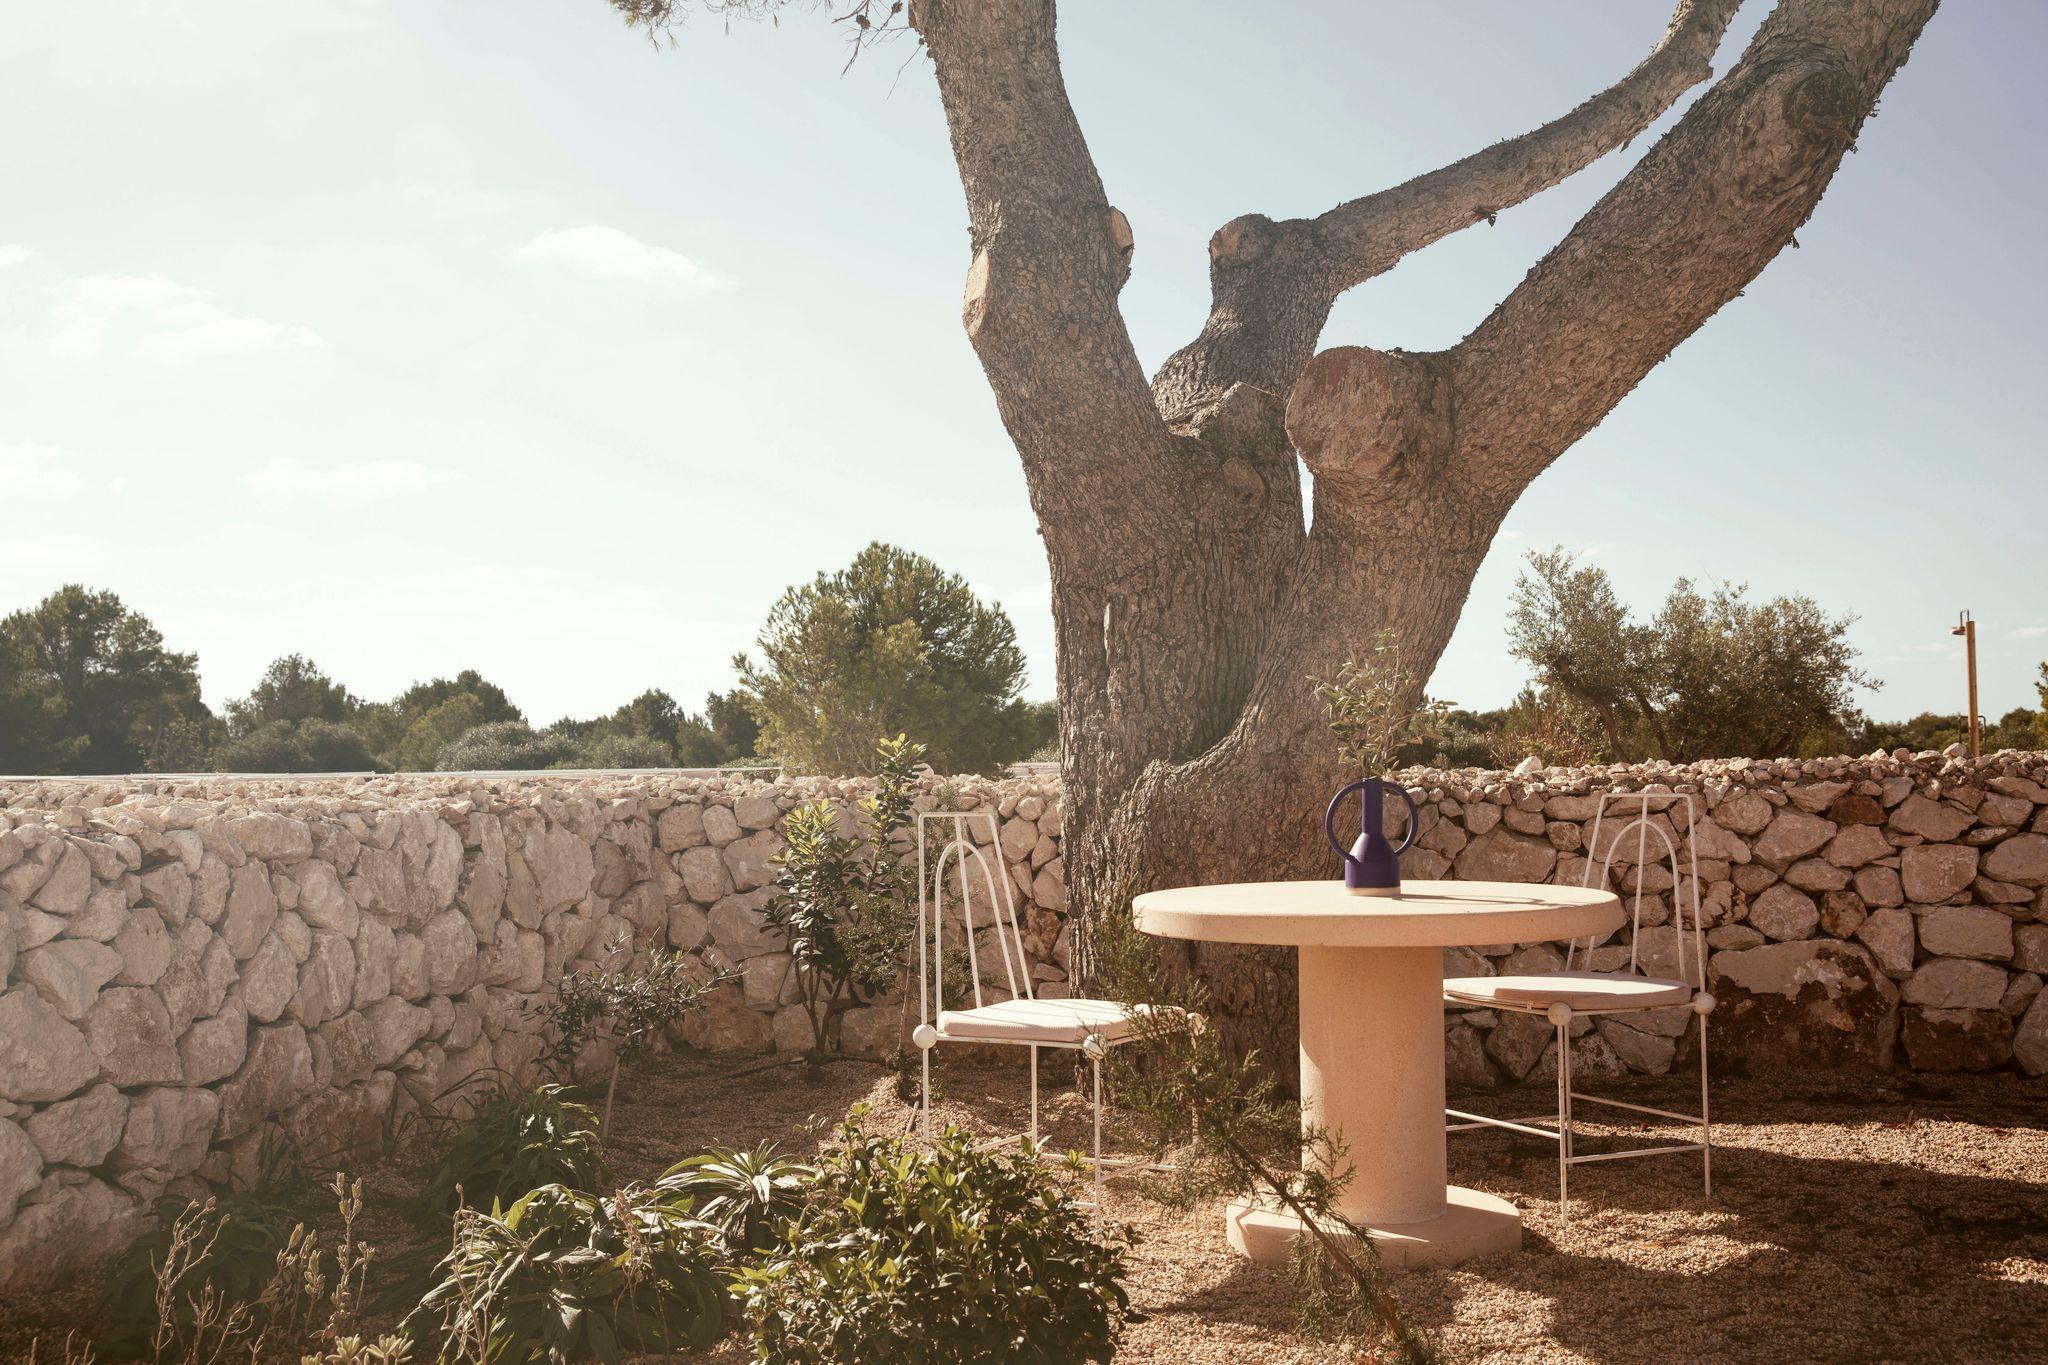 Habitación Mahon Garden 1 hotel experimental de Menorca